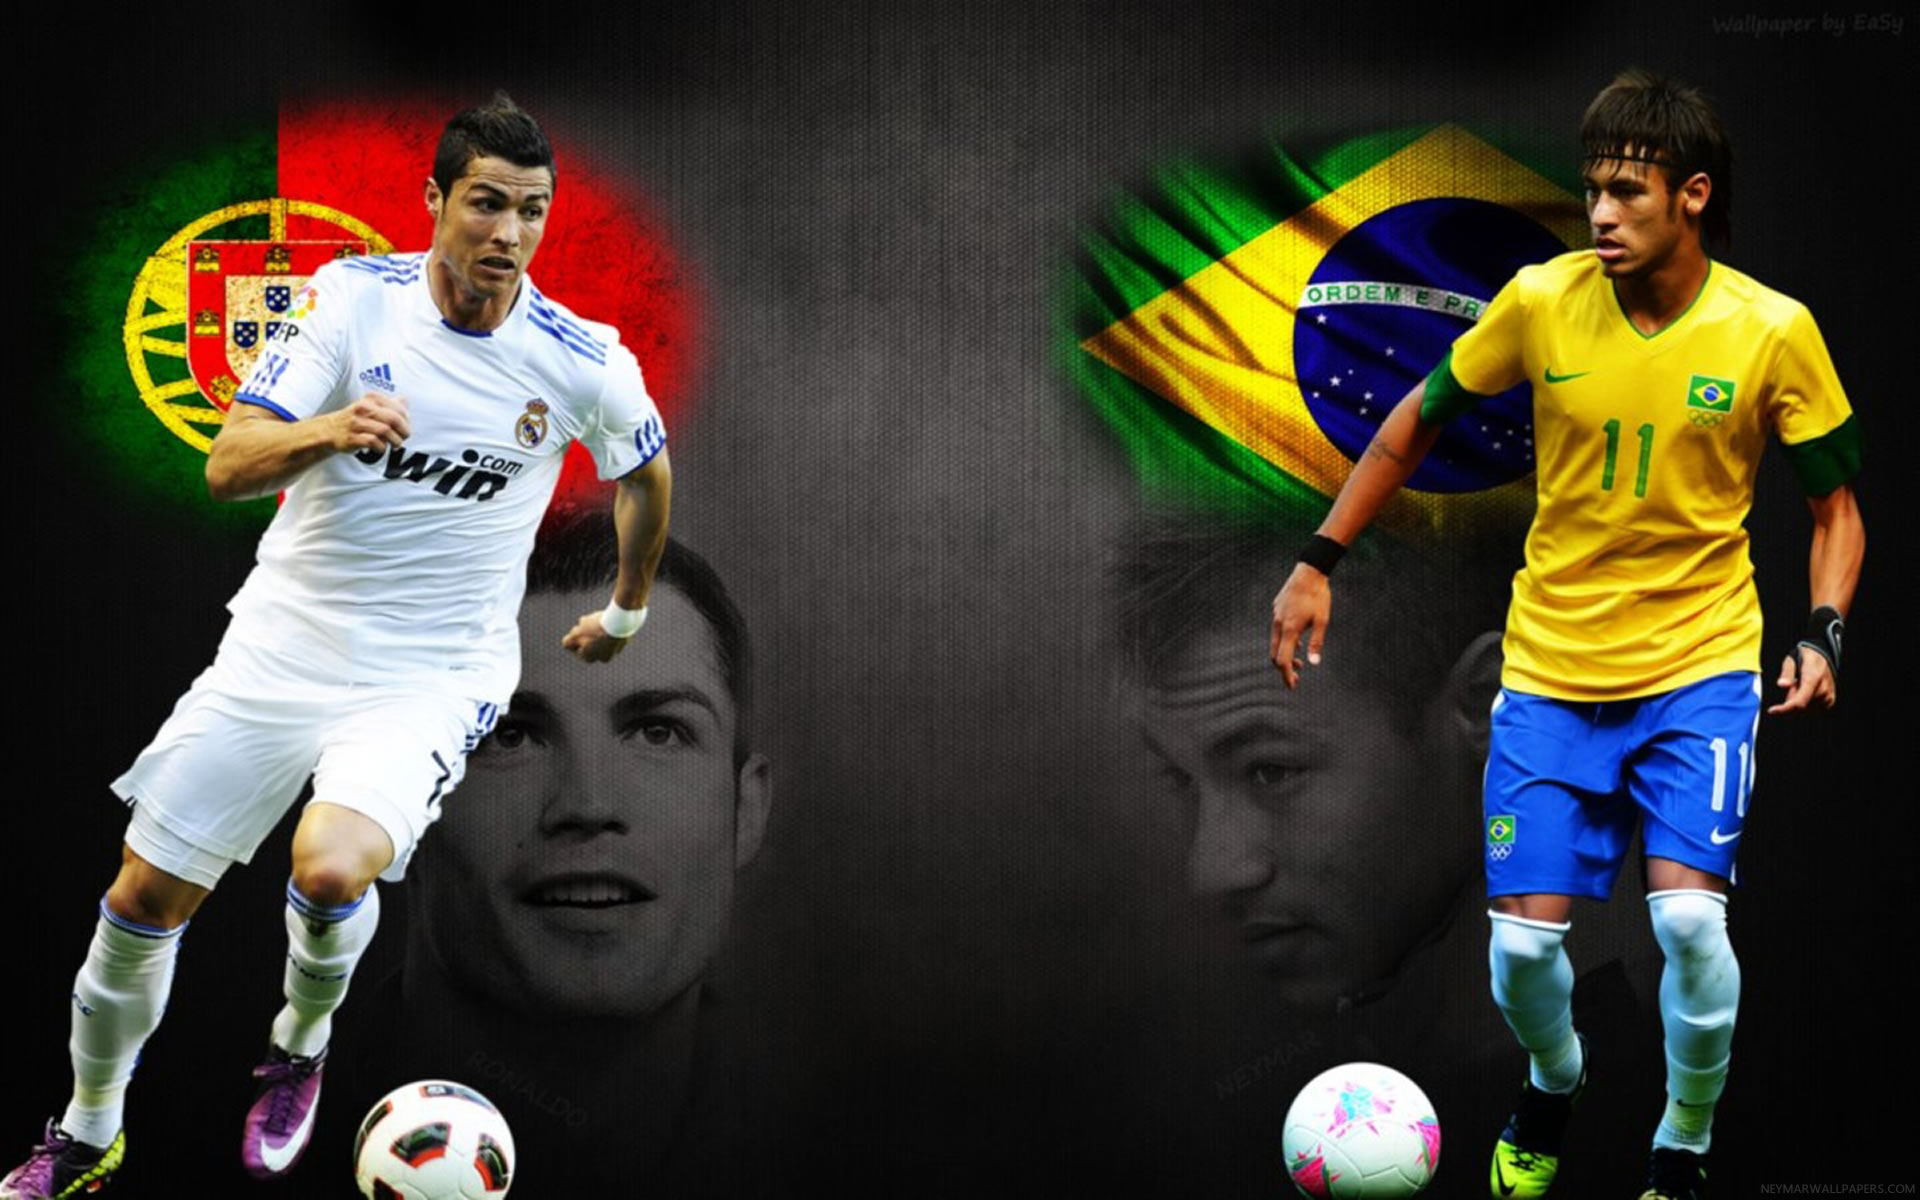 Neymar vs Cristiano Ronaldo wallpaper